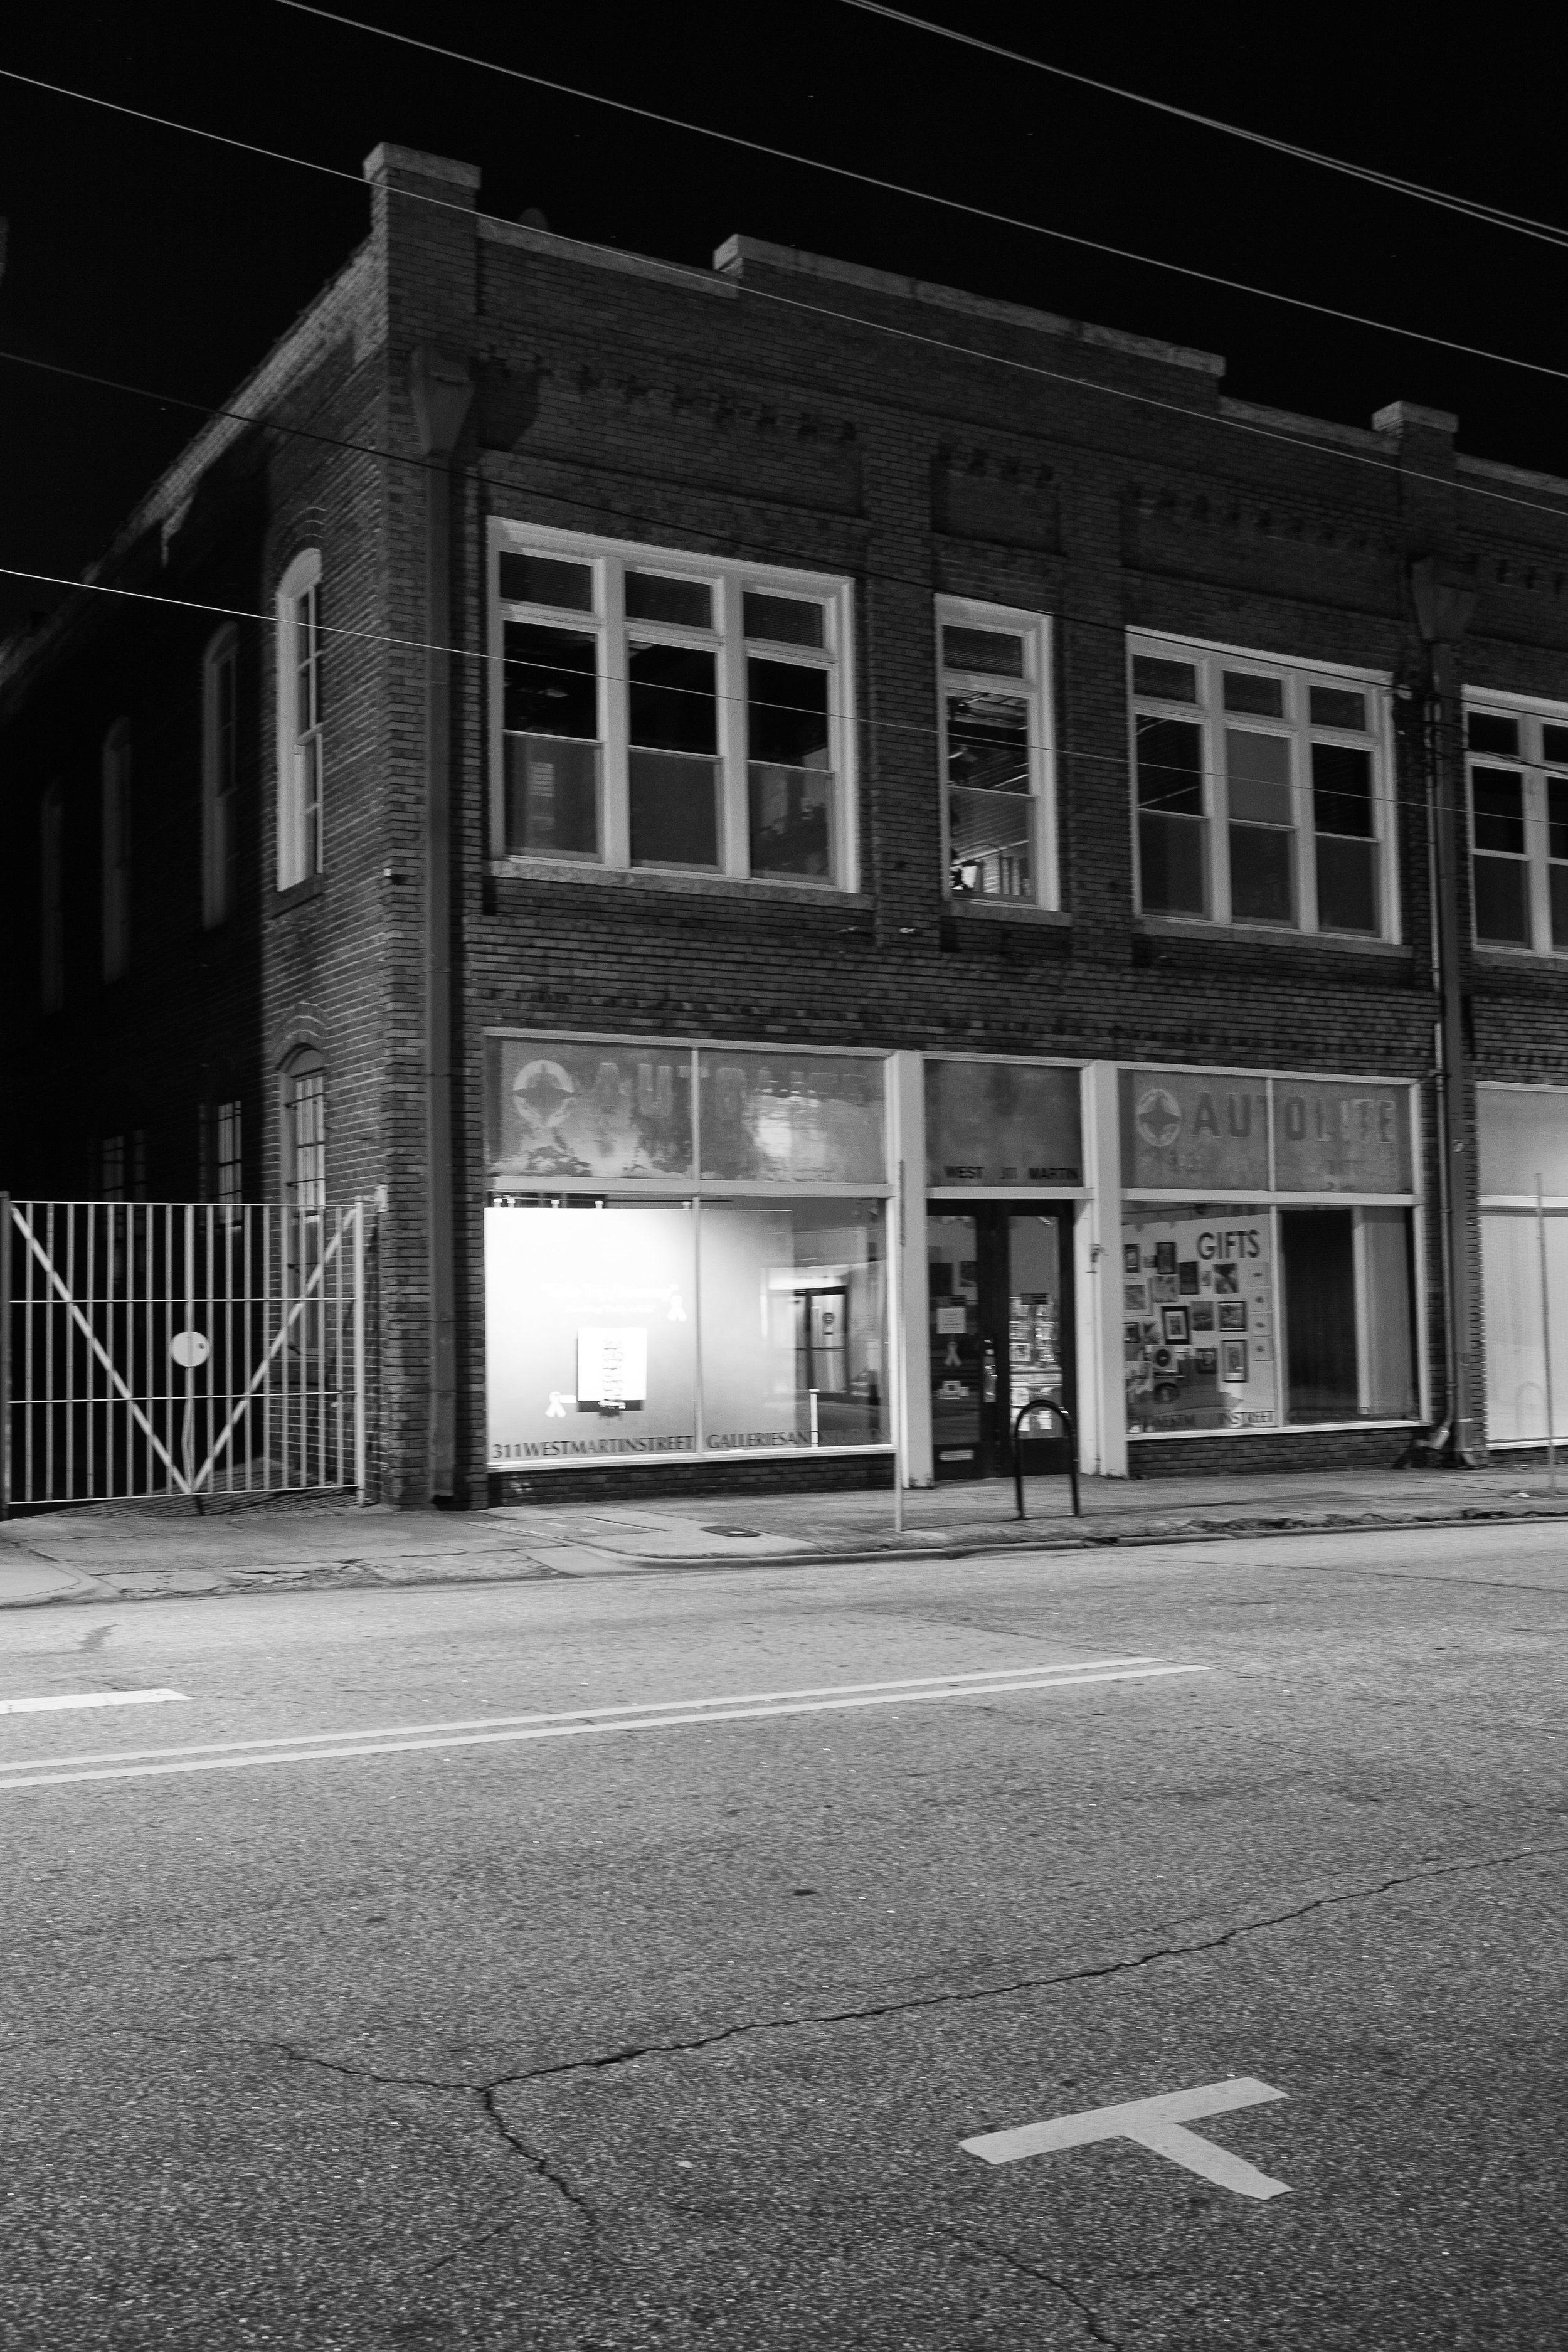 downtown-20141026-DSC02174-Edit.jpg